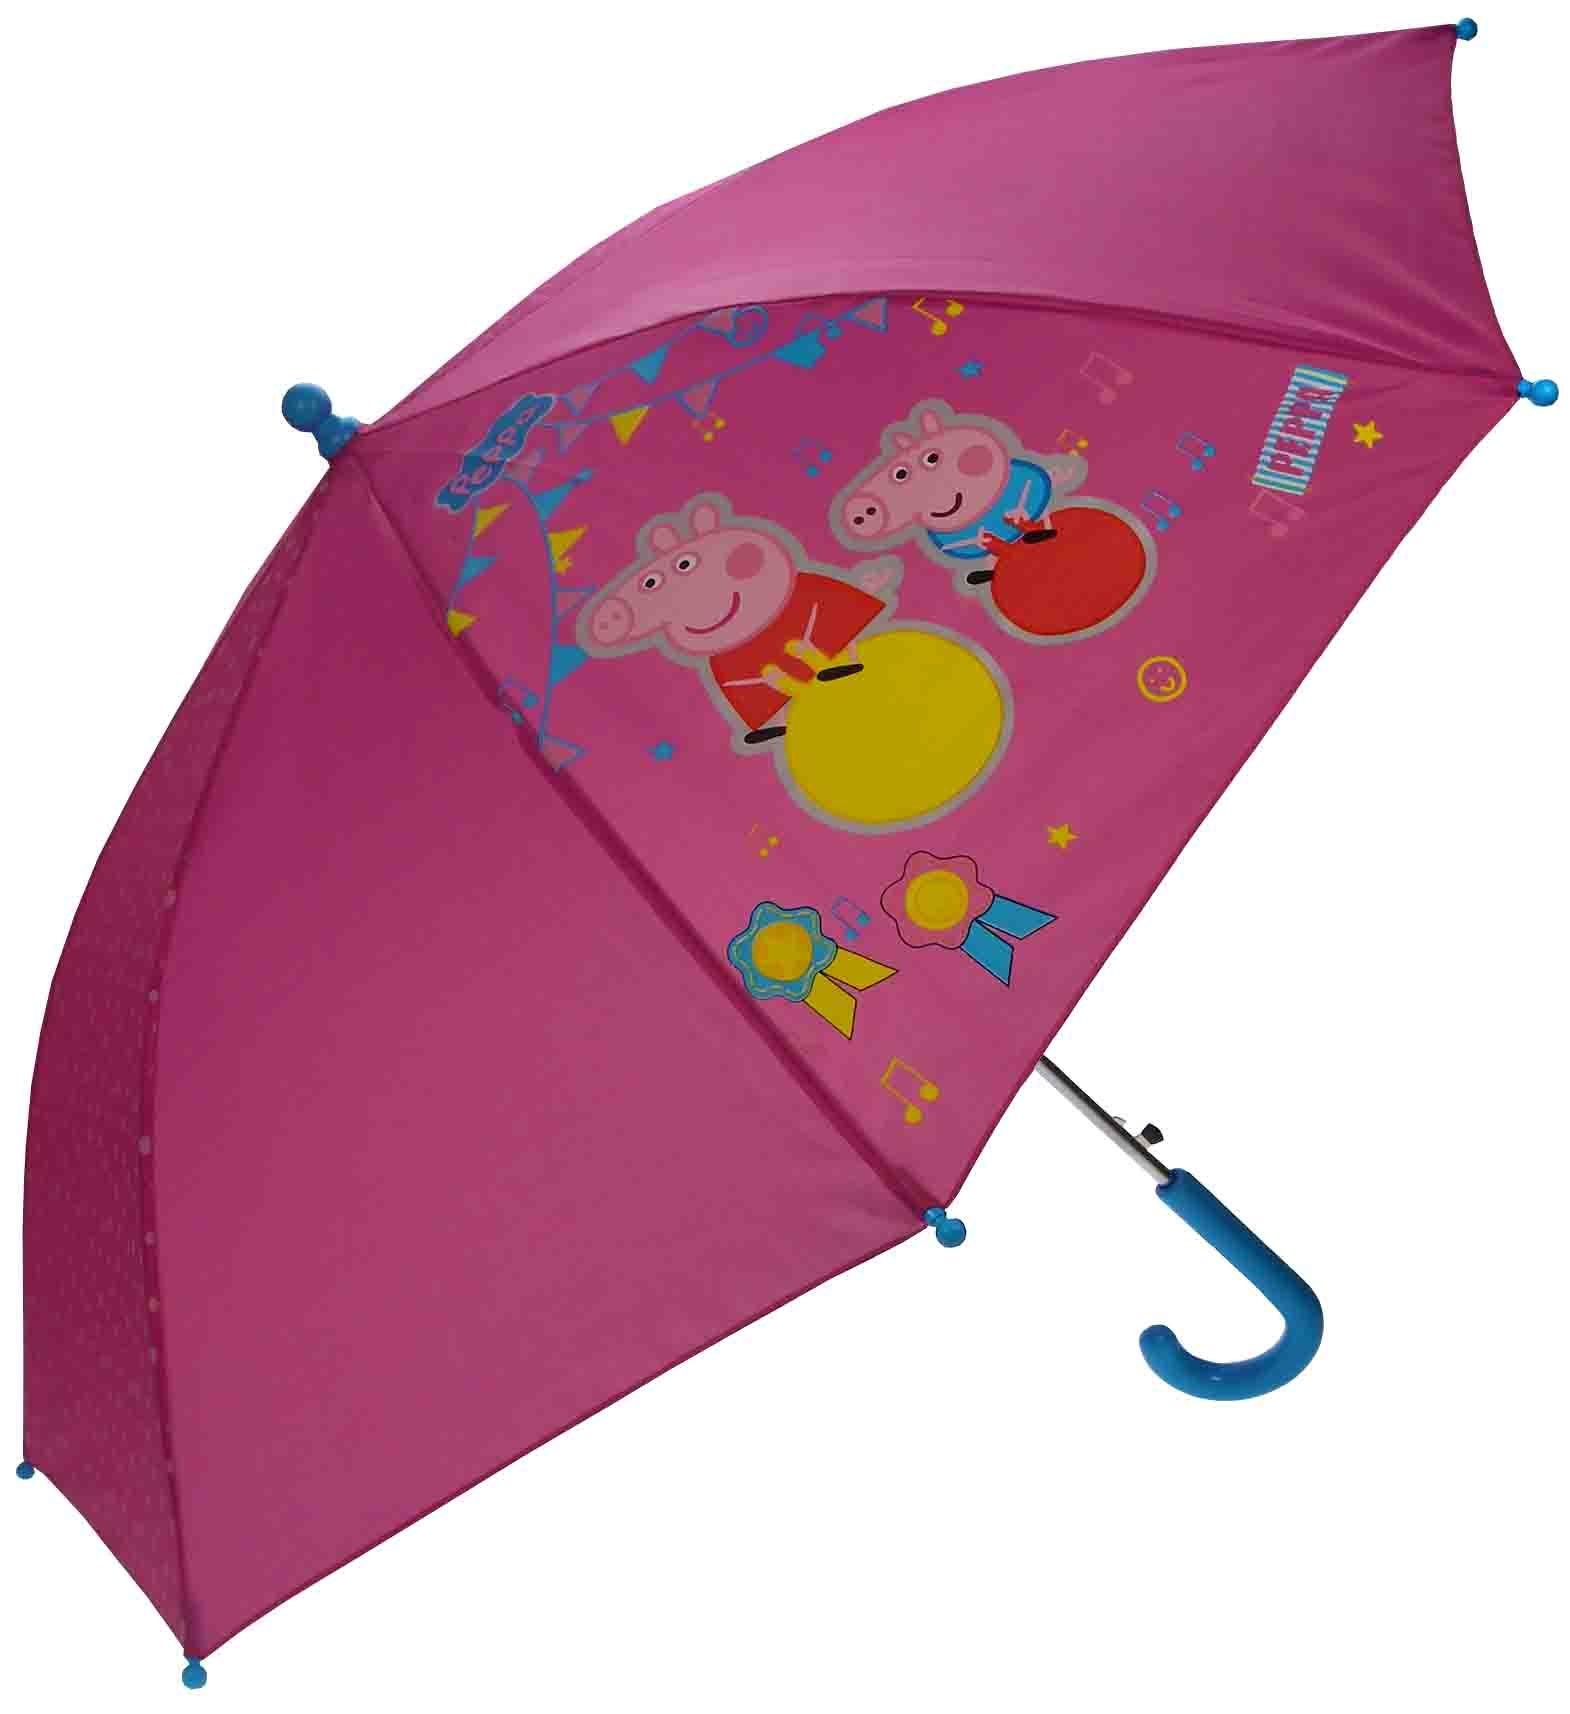 Peppa-Pig-Party-Spiele-Regenschirm-automatic